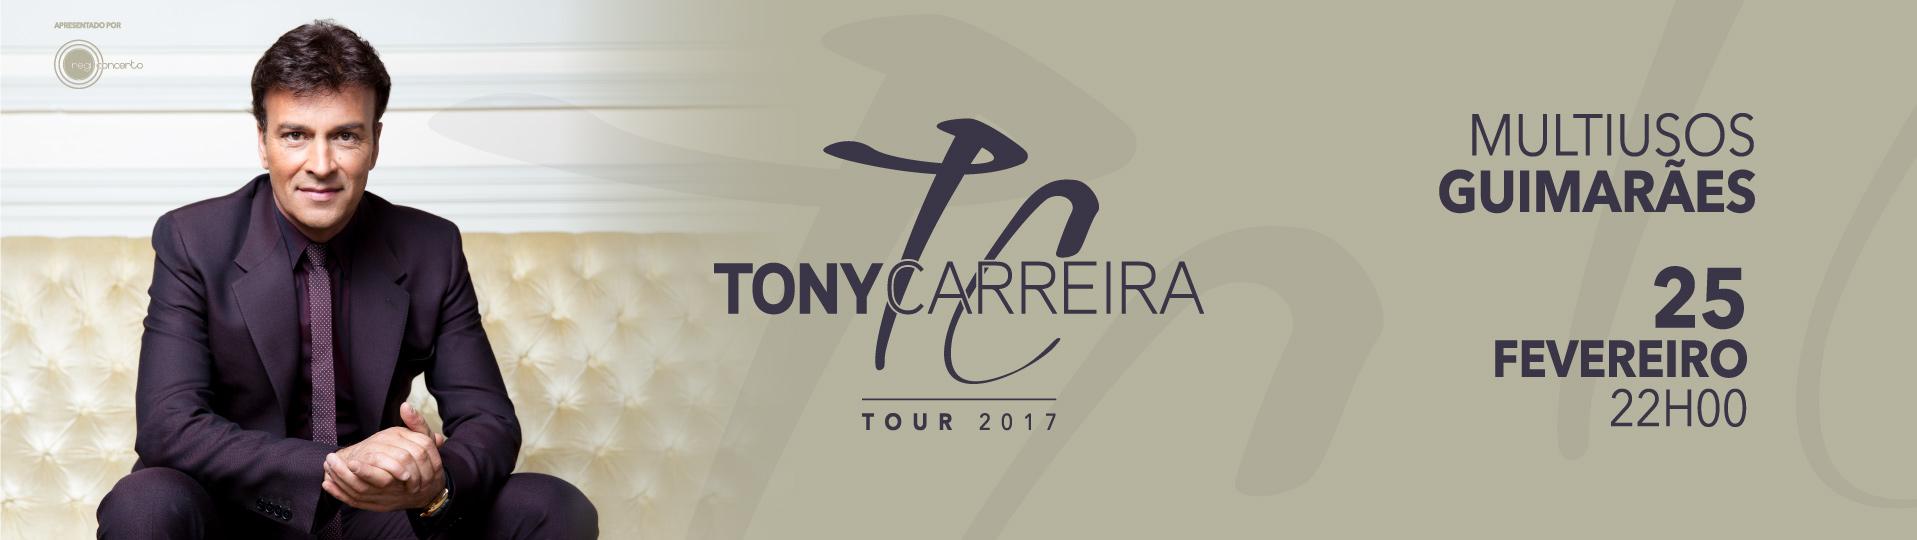 TONY CARREIRA - TOUR 2017